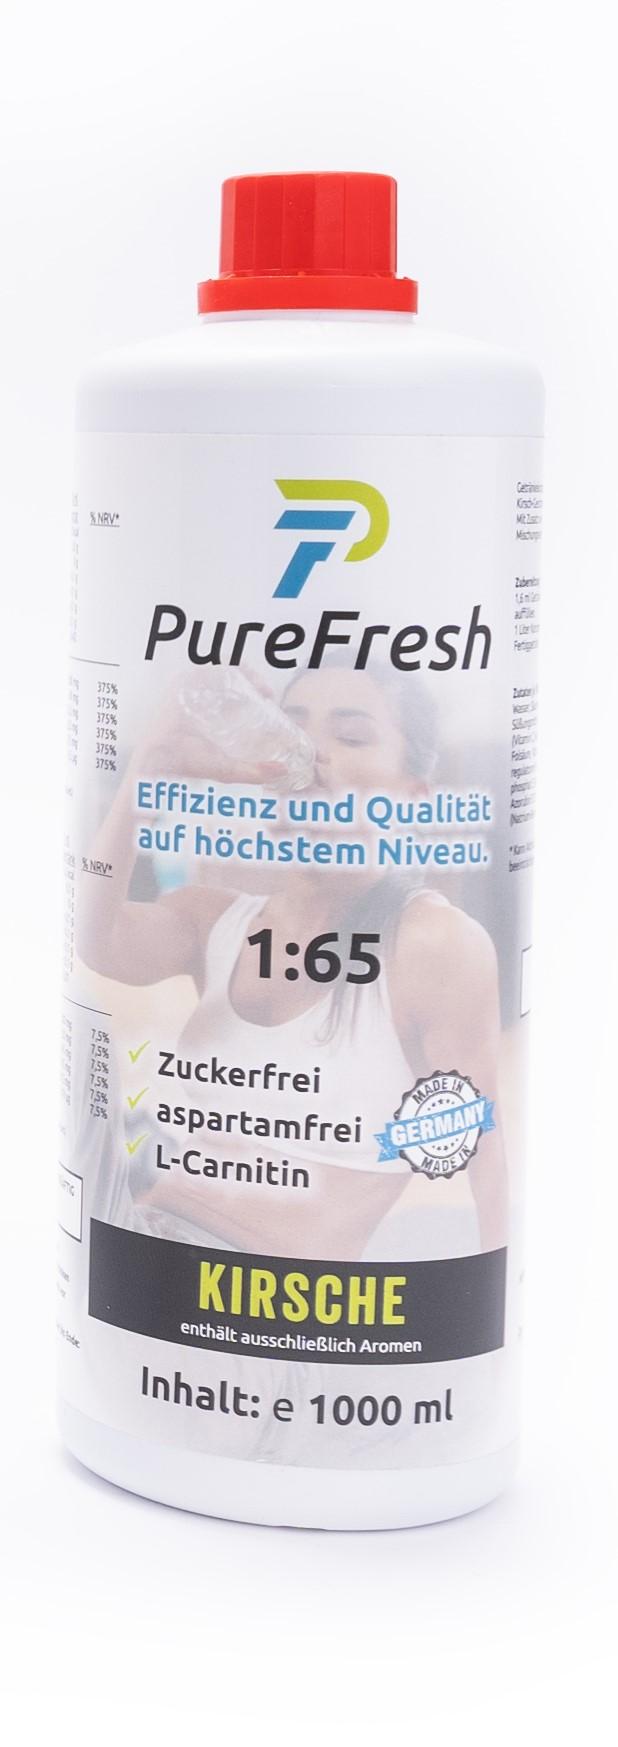 PureFresh 1L Flasche